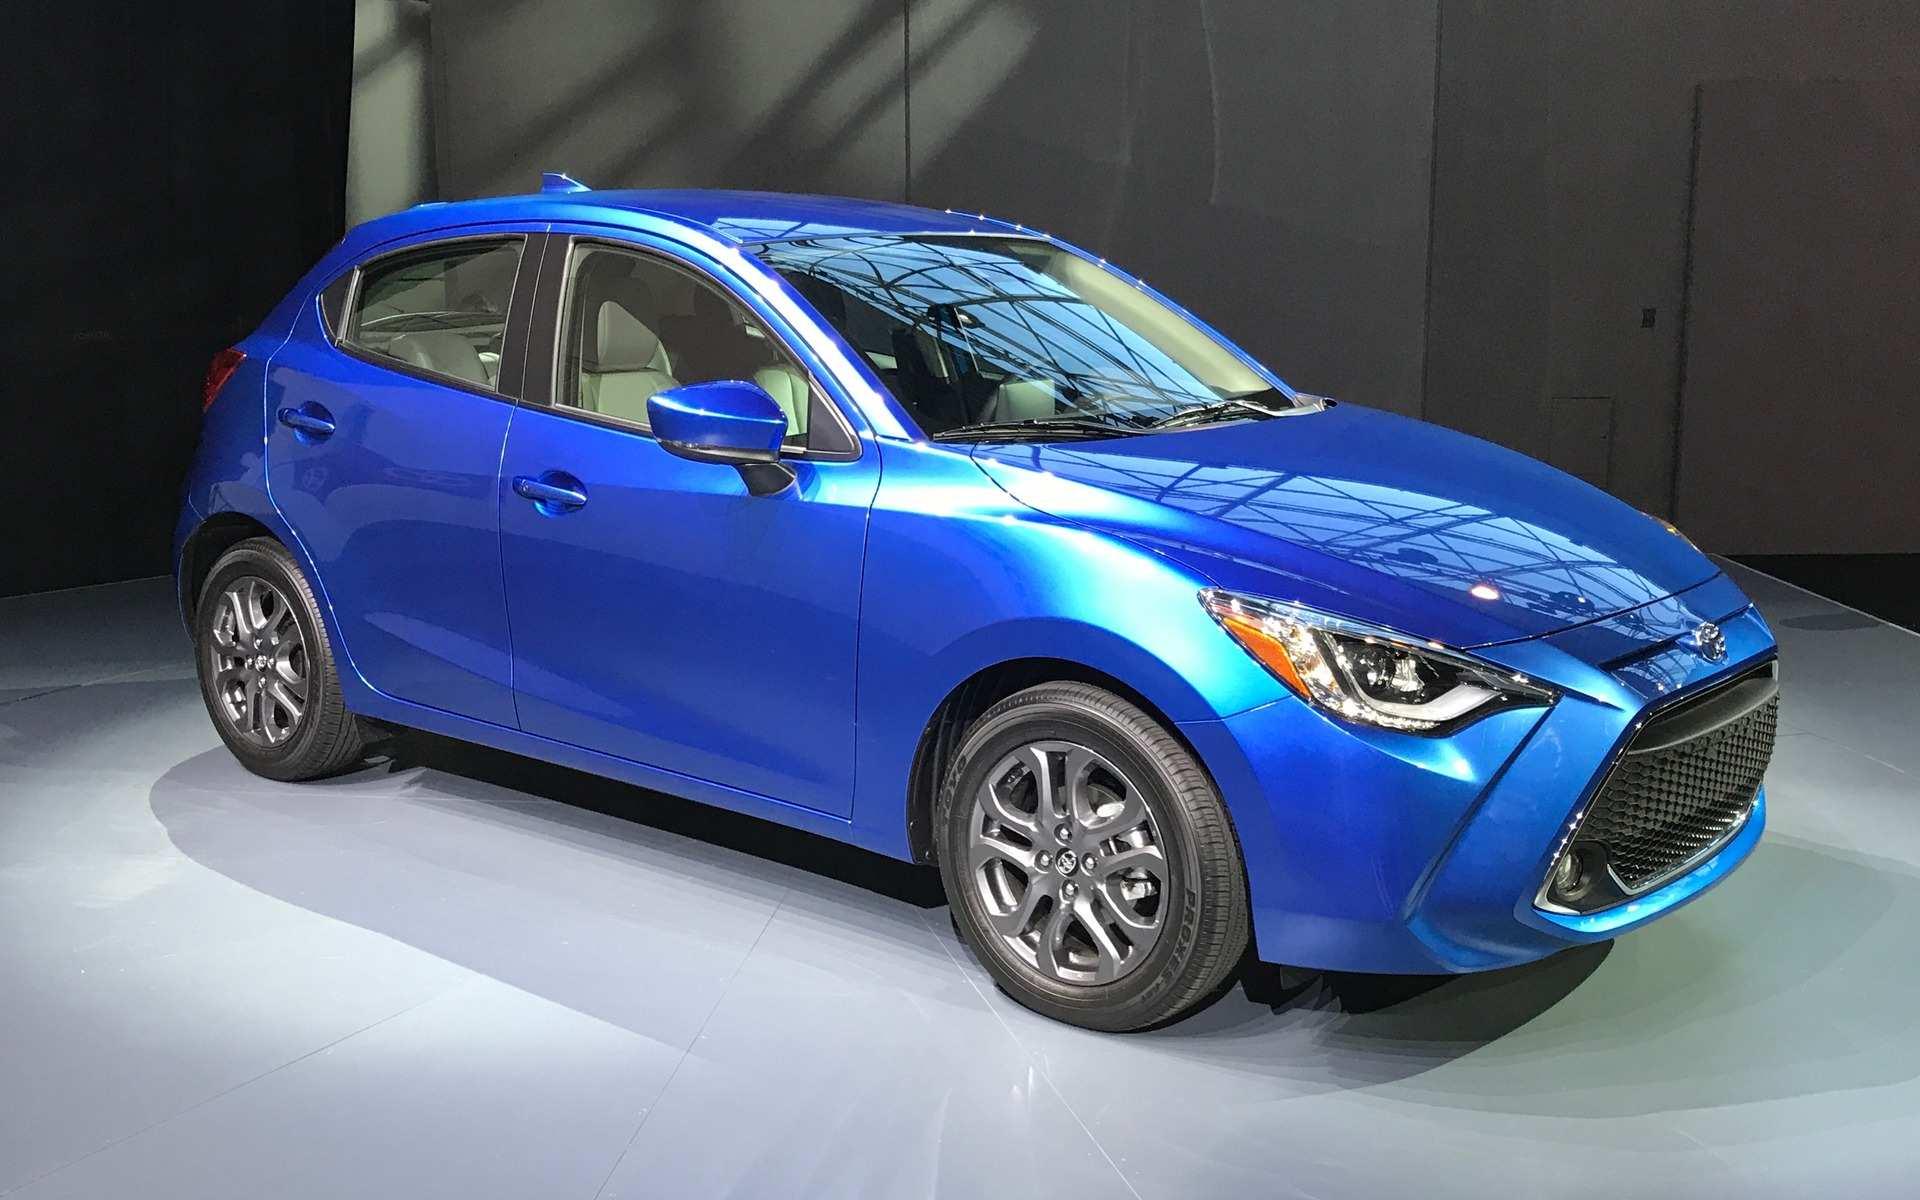 85 All New Toyota Yaris Sedan 2020 Overview with Toyota Yaris Sedan 2020